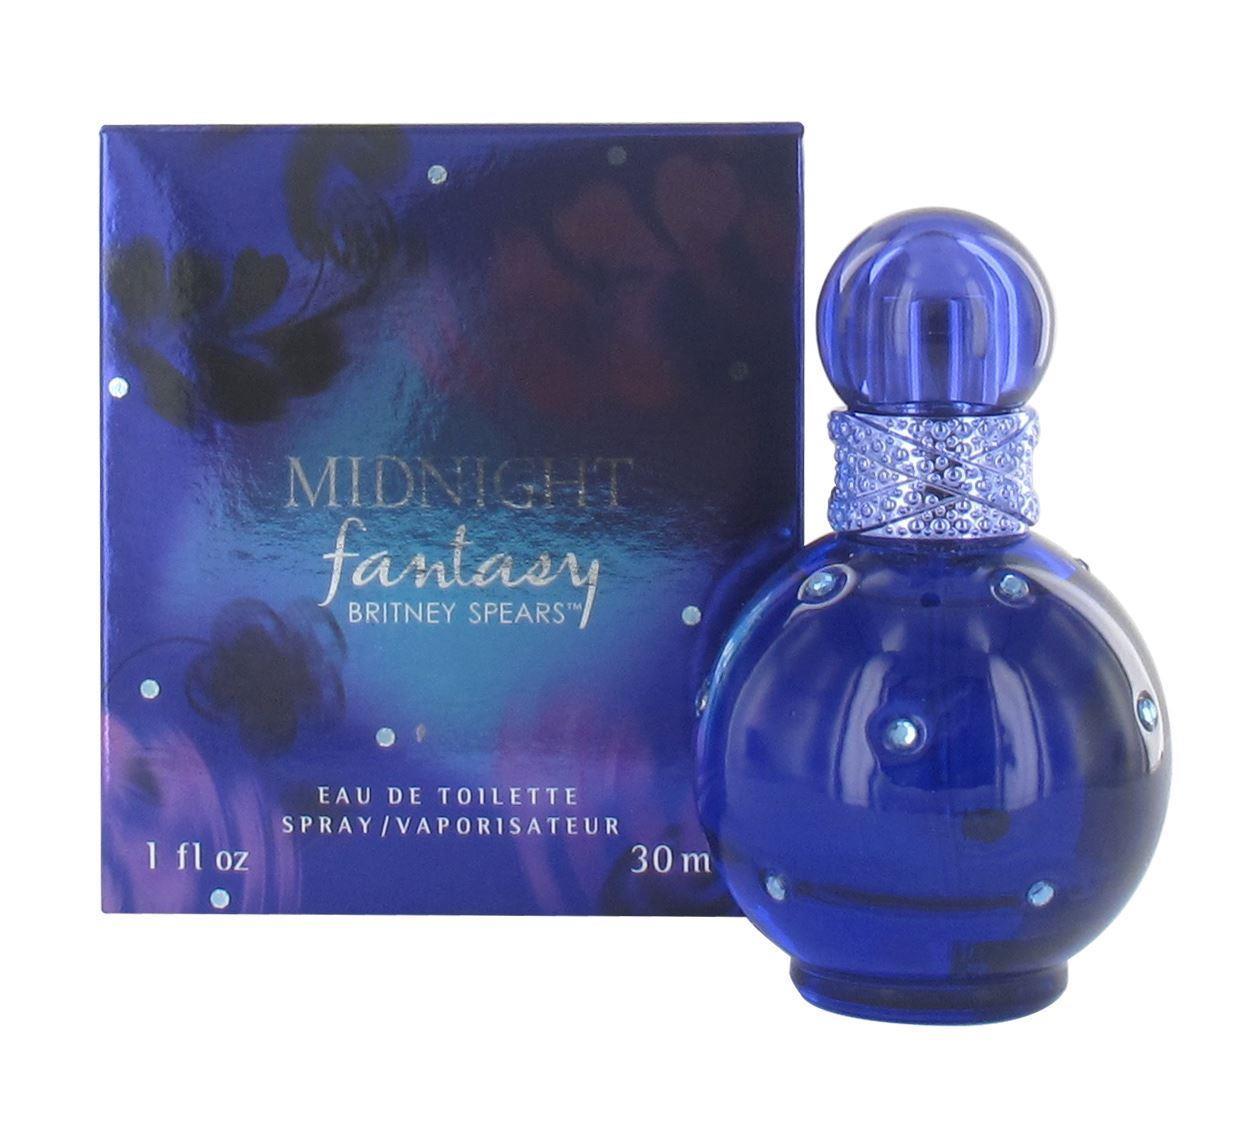 Britney Spears Midnight Fantasy 30ml Eau de Toilette Spray